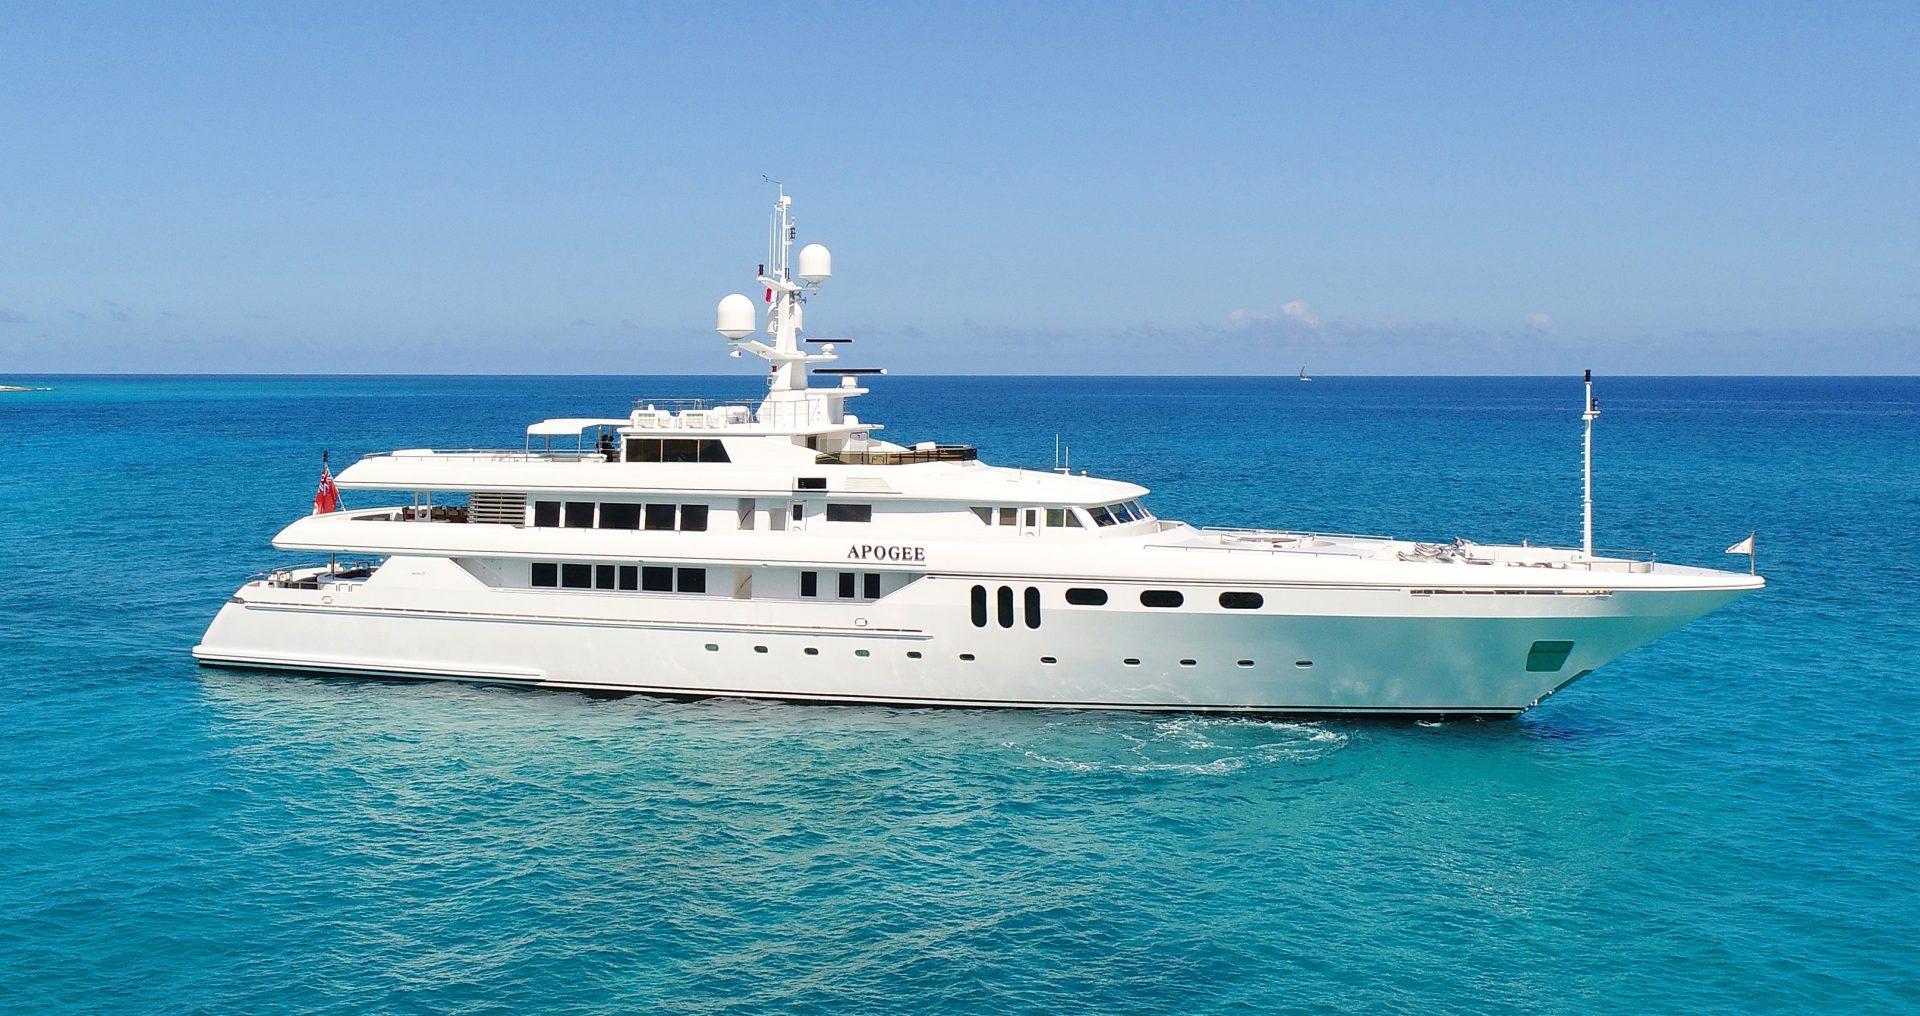 APOGEE yacht Charter Brochure